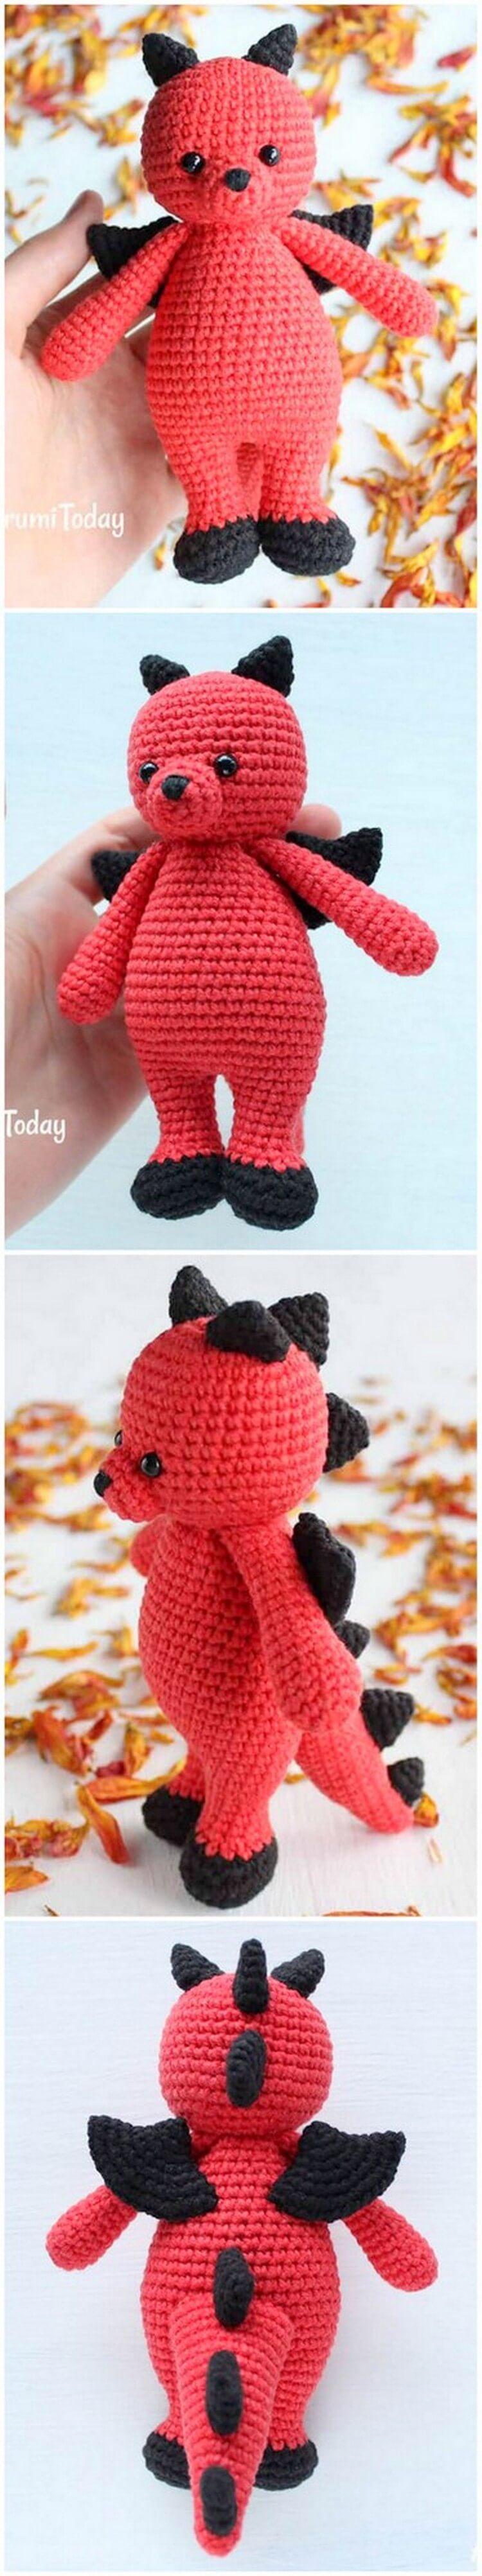 Crochet Amigurumi Pattern (45)